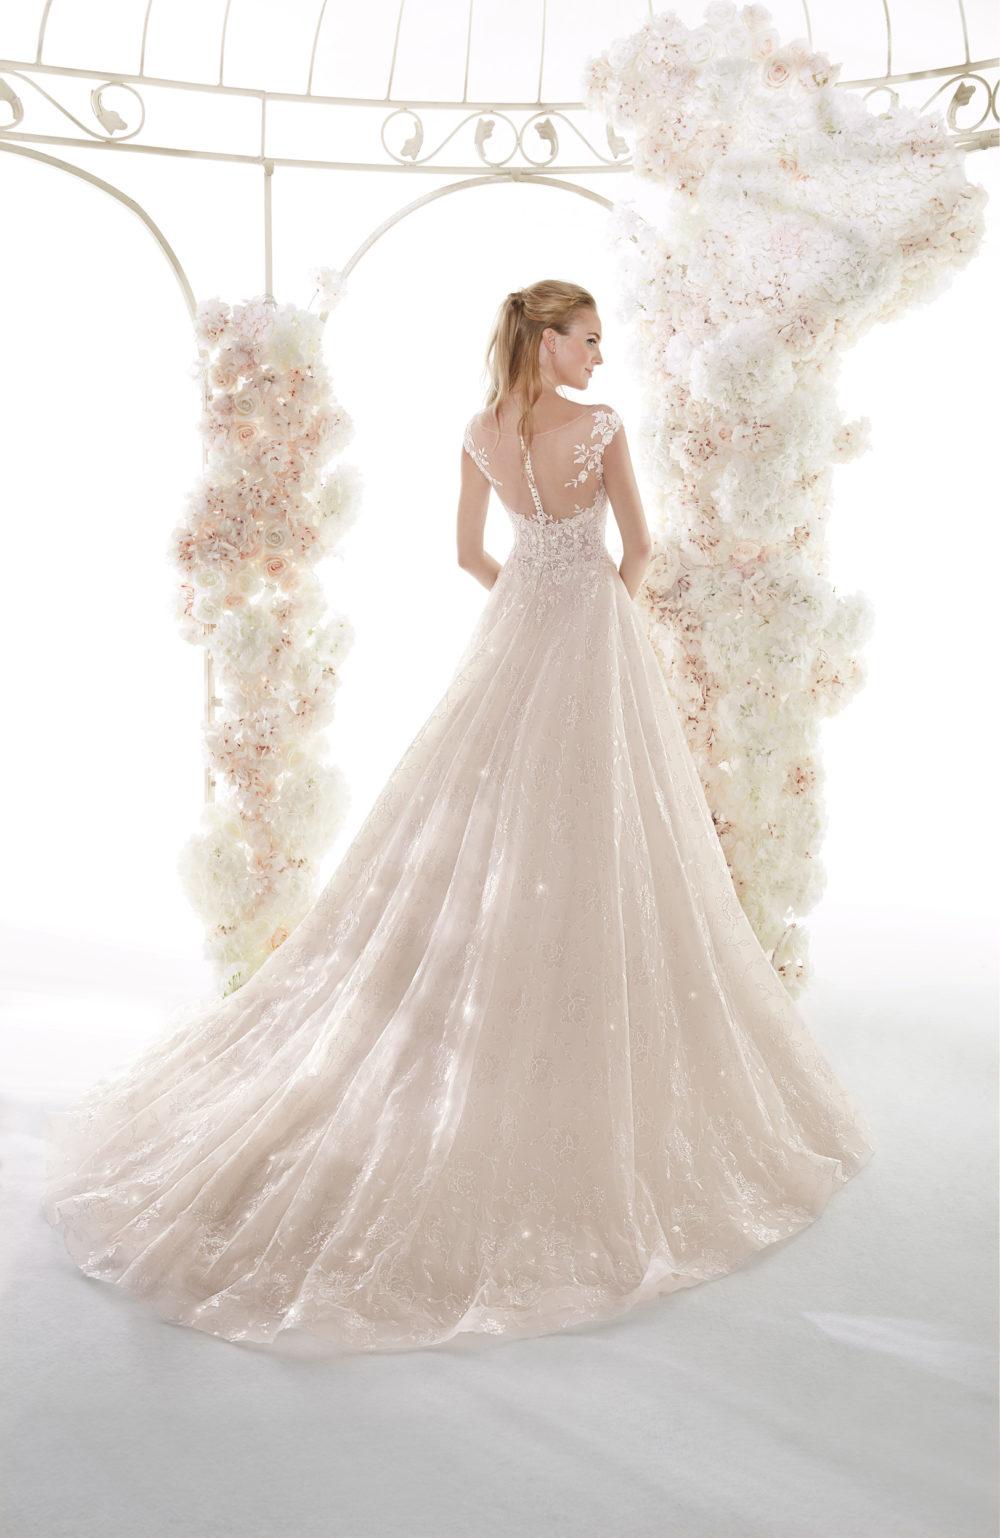 Mariages: abito da sposa Colet 2020 a Vicenza, Verona, Padova, Veneto COA20901